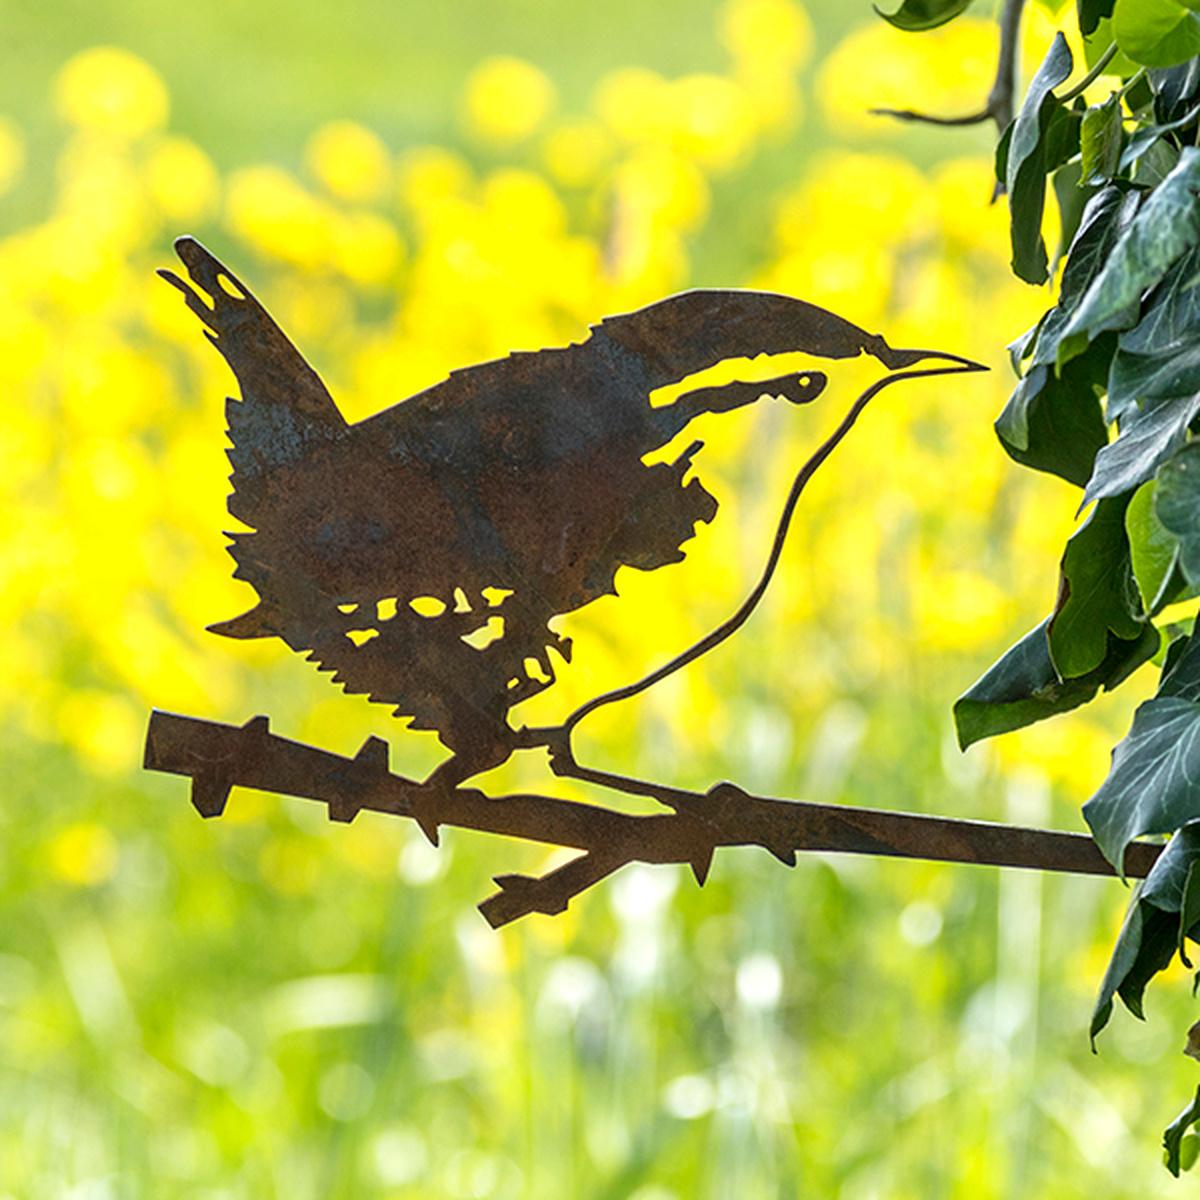 Metalbird fugl i cortenstål - gærdesmutte